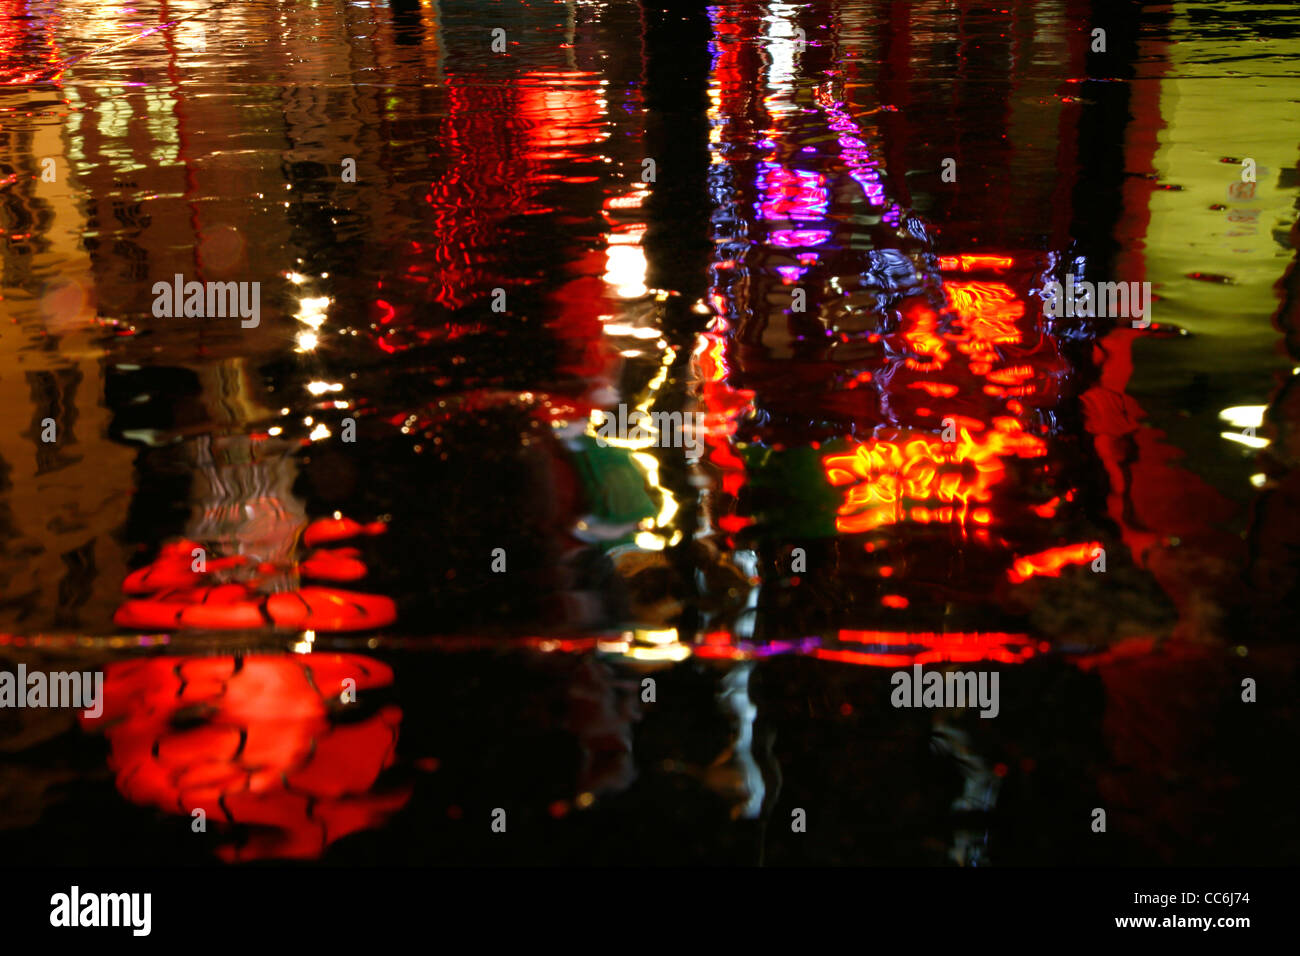 Rainy reflection of a Chinese lantern on Wardour Street, Chinatown, London, UK - Stock Image